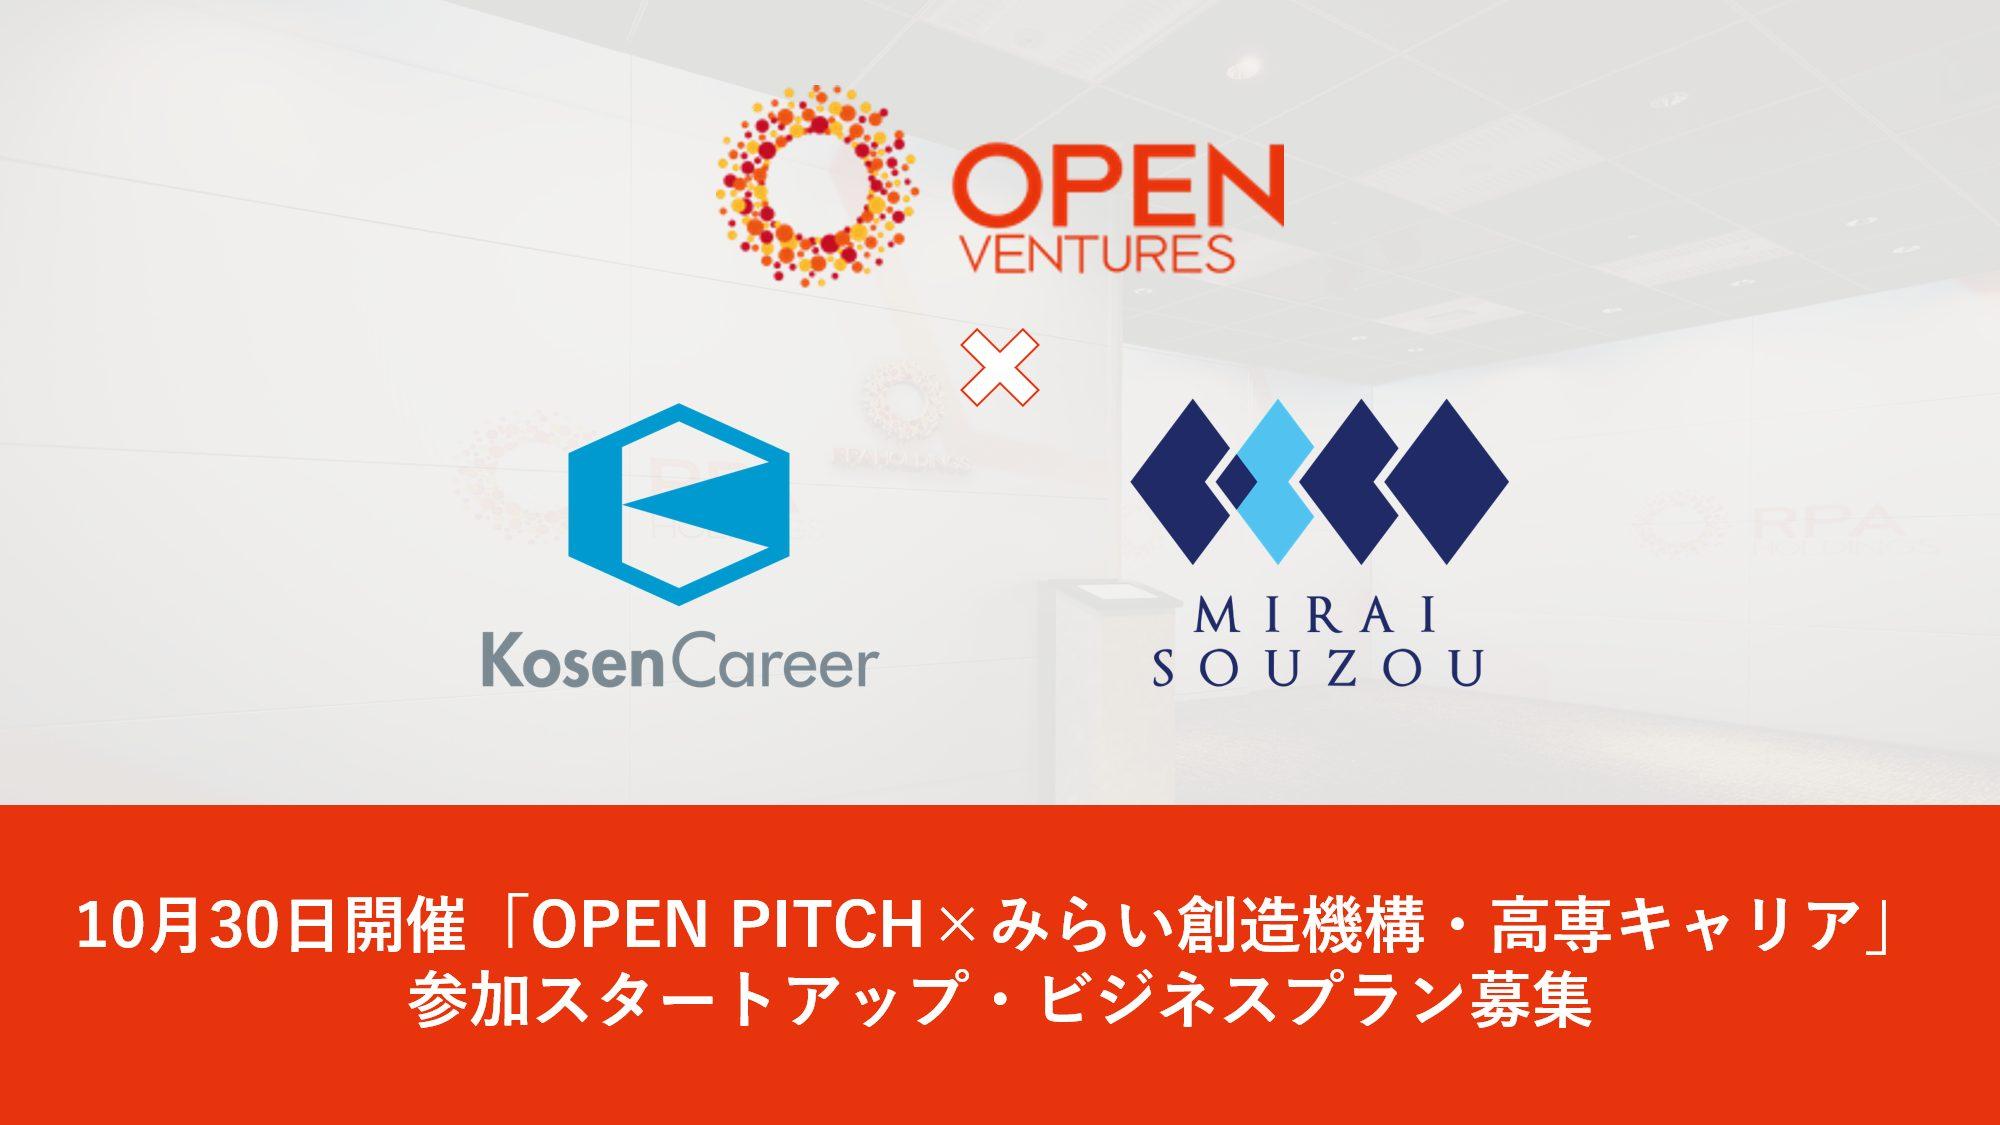 OPEN VENTURES、みらい創造機構・高専キャリアとスタートアップ向けピッチコンテスト「OPEN PITCH」を共同開催!スタートアップ・ビジネスプランの募集を開始